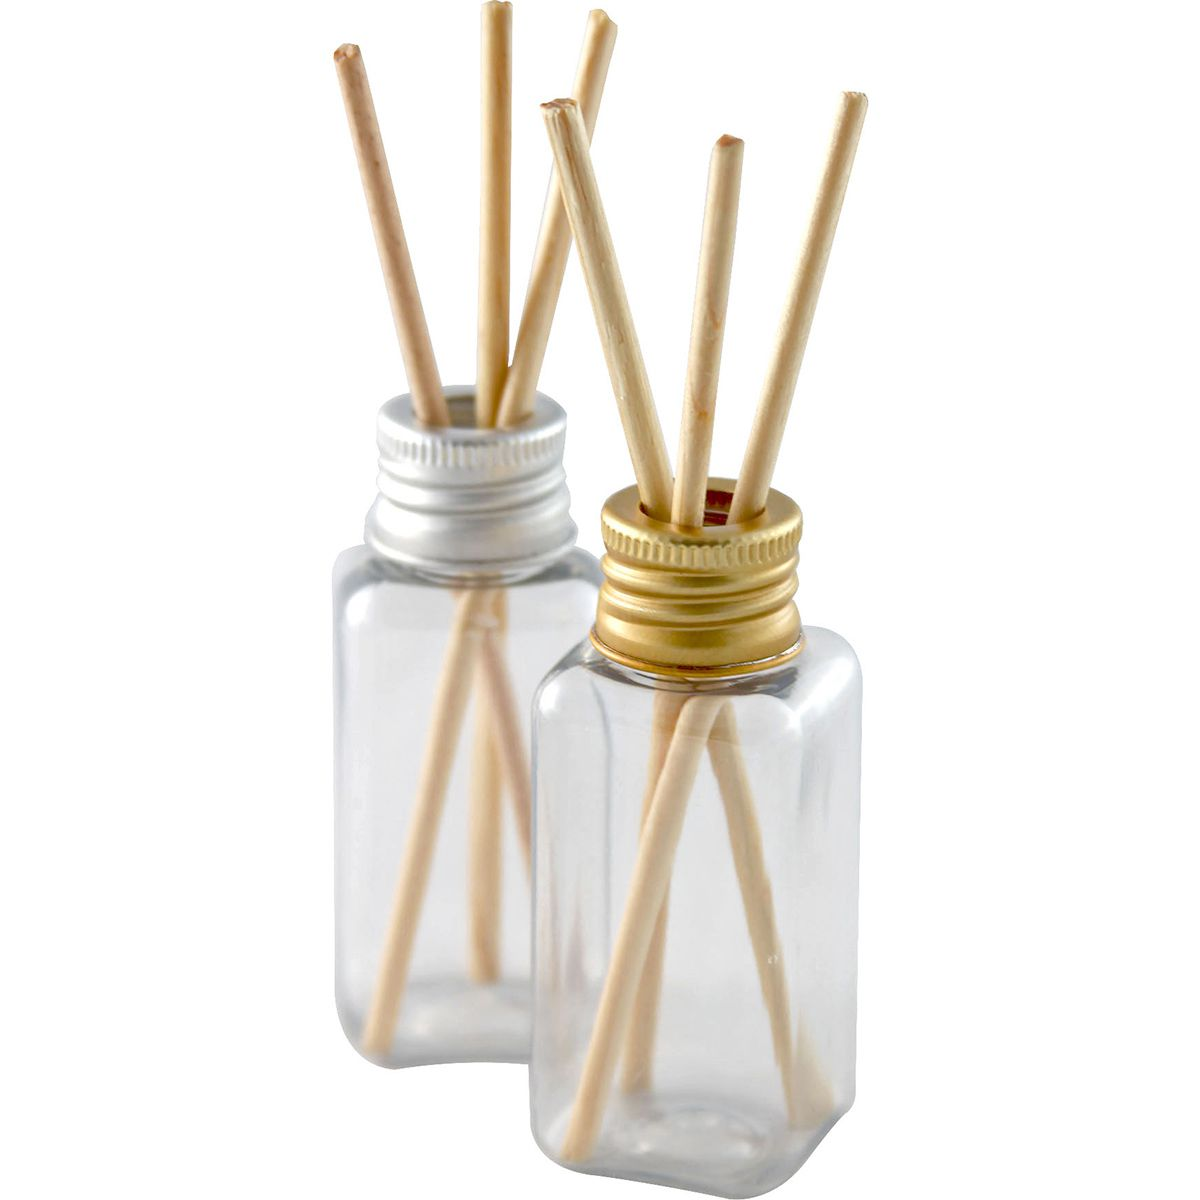 Frasco para Aromatizador Atacado Plástico de 40 ml kit com 120 unidades